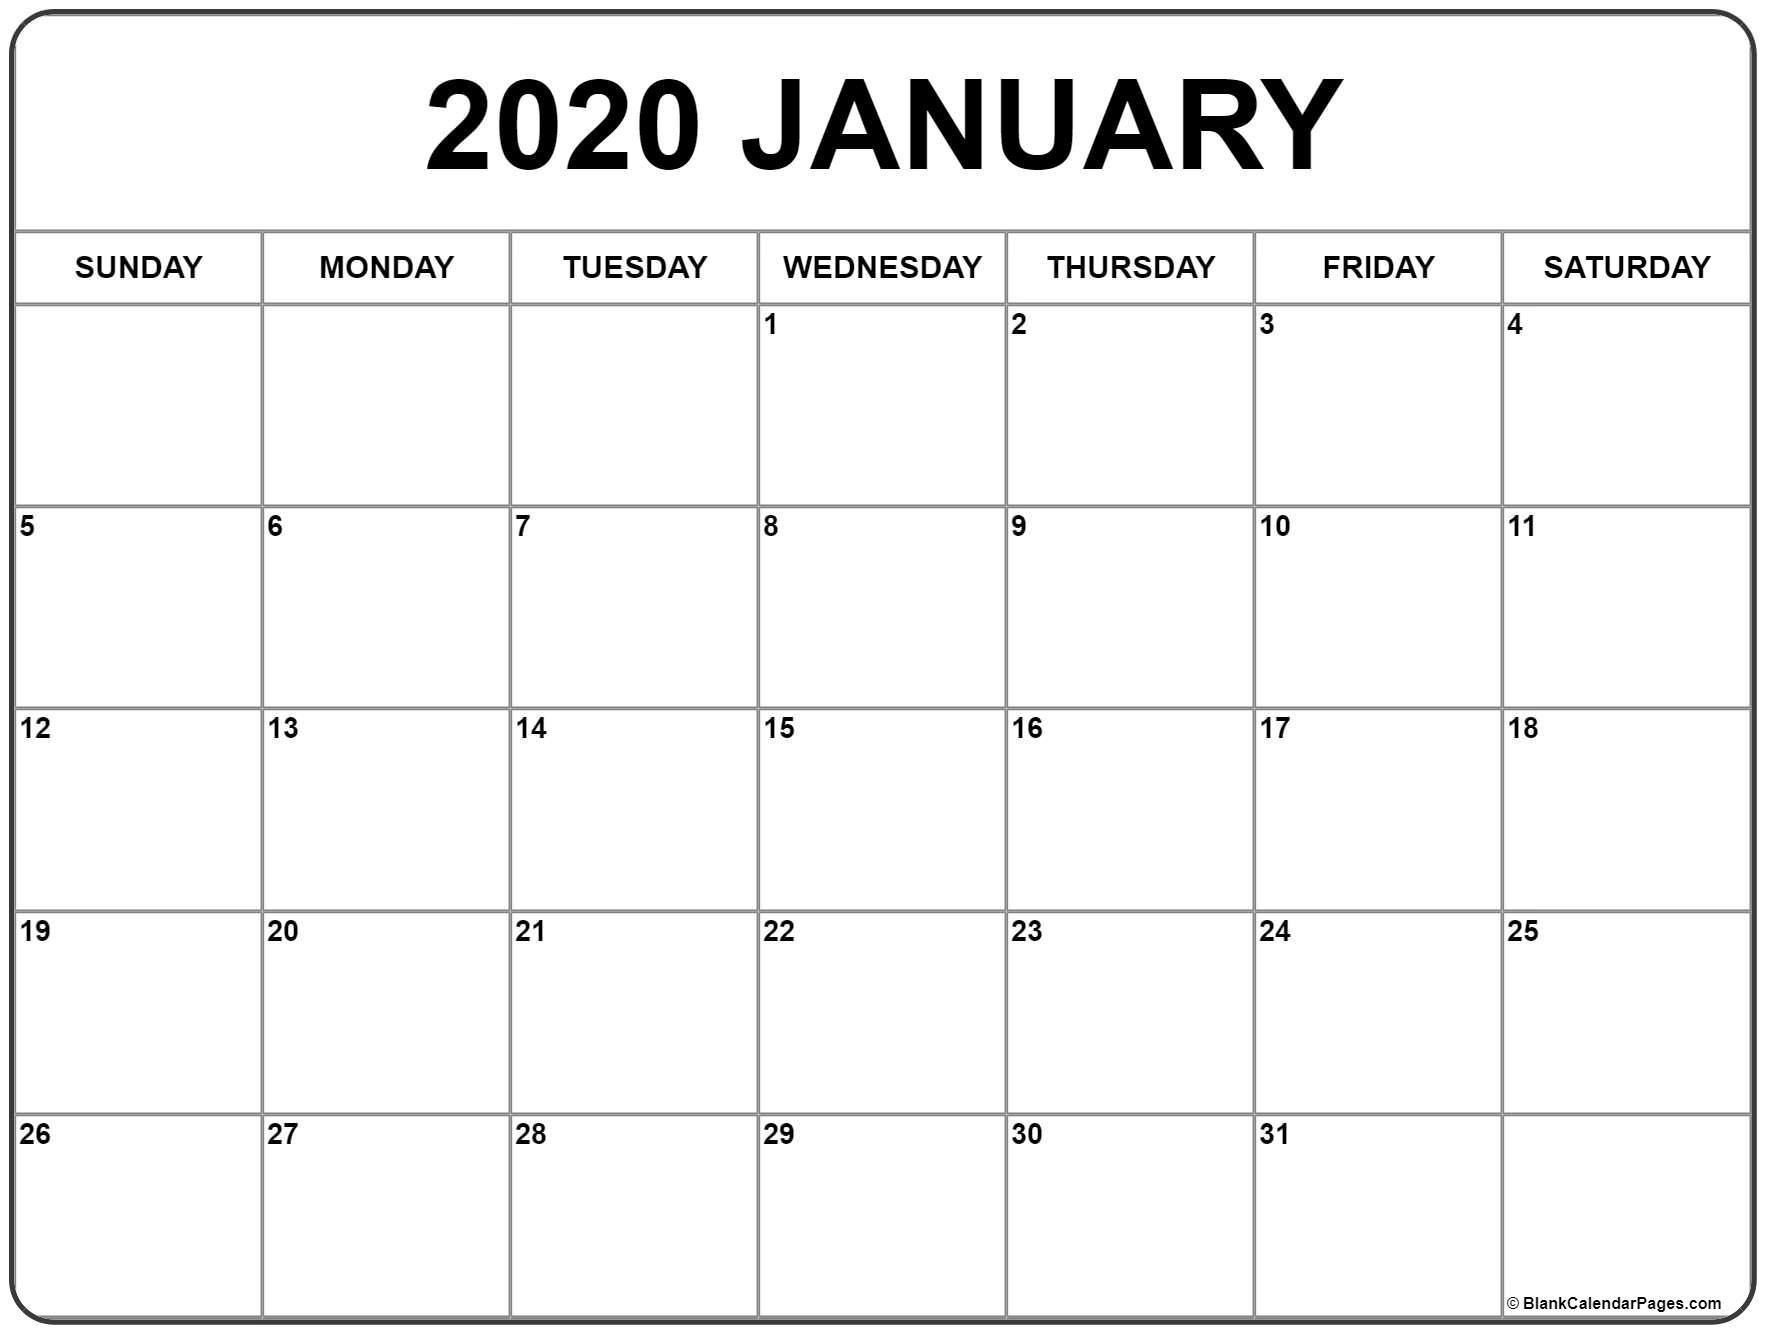 January 2020 Calendar | Free Printable Monthly Calendars with Google Free Printable Calendars 2020